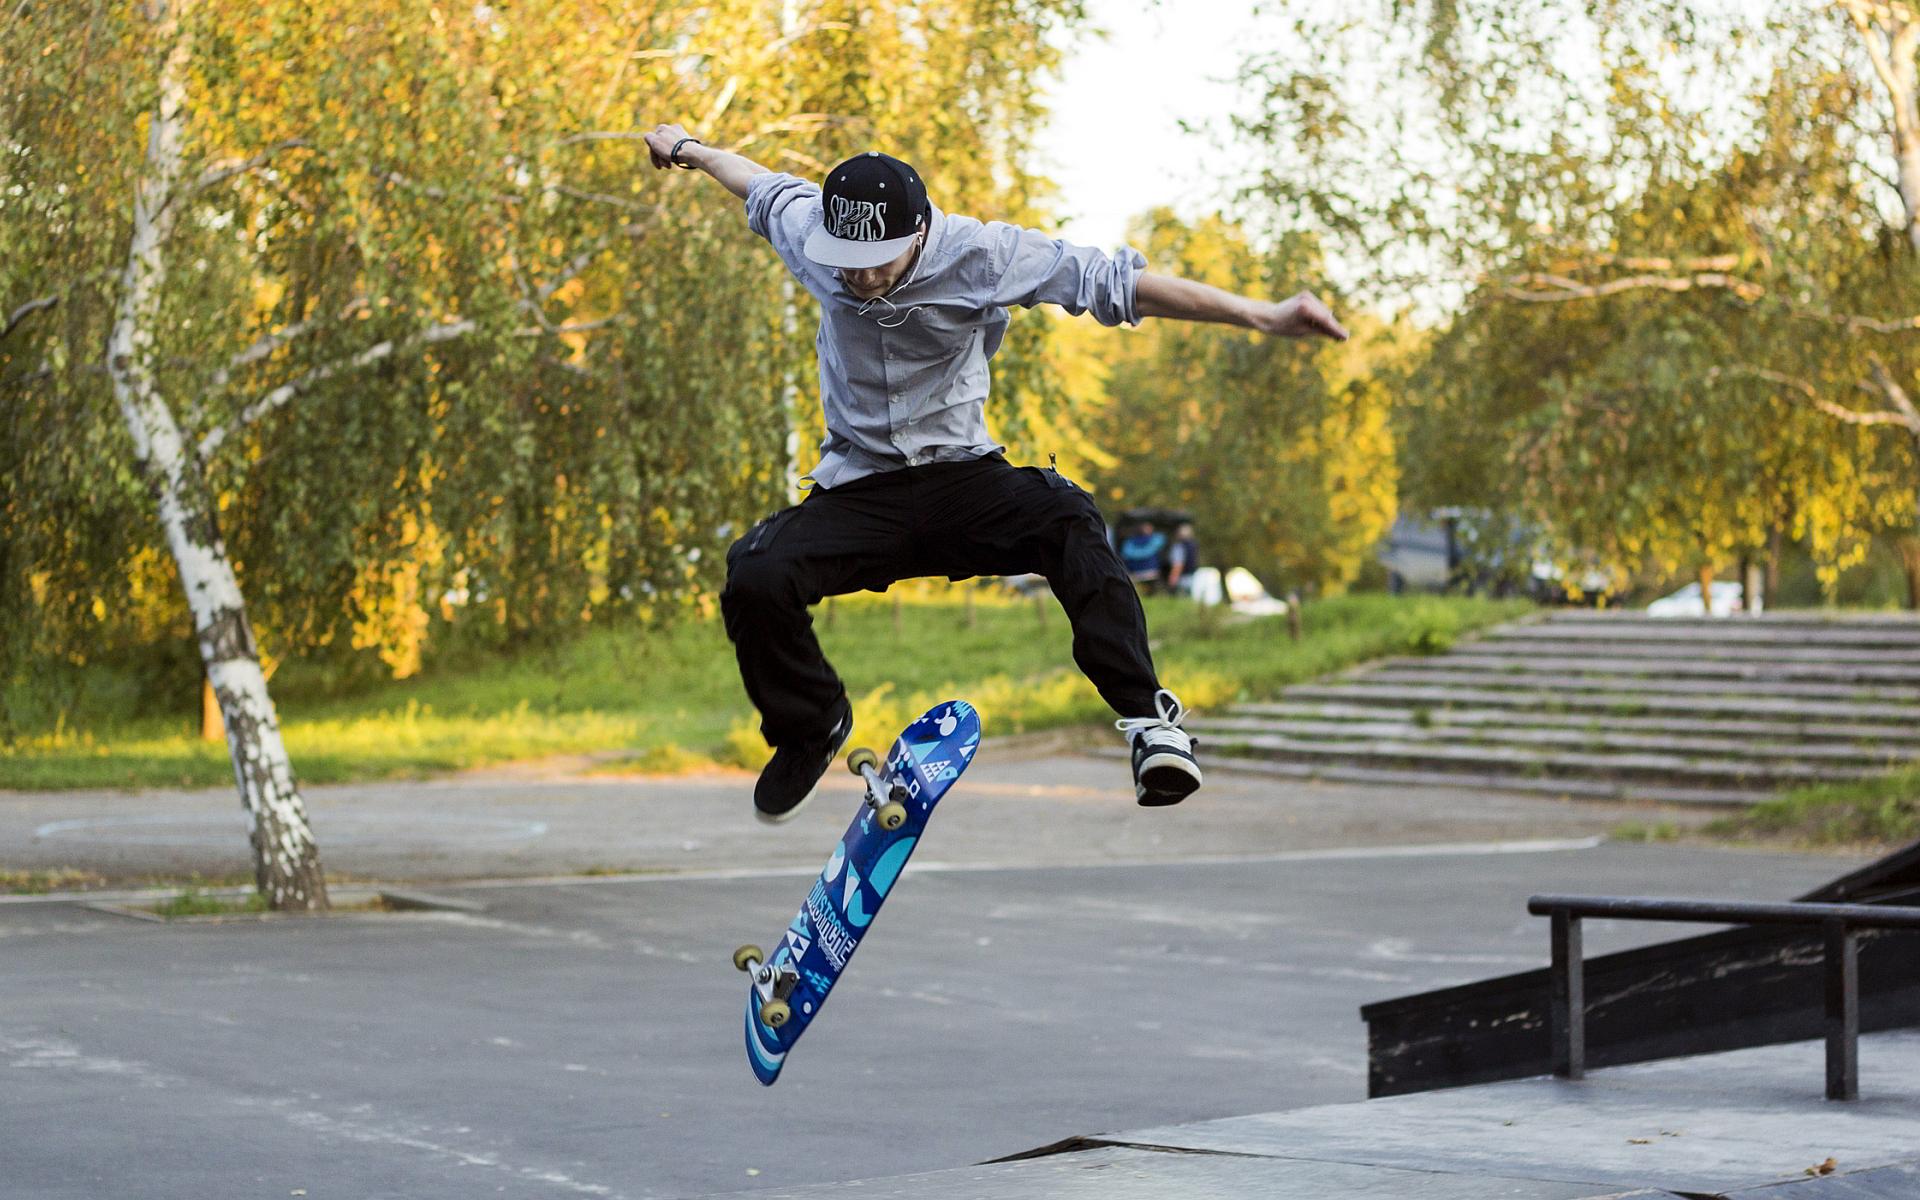 Kickflip skateboard wallpaper | 1920x1200 | #34848